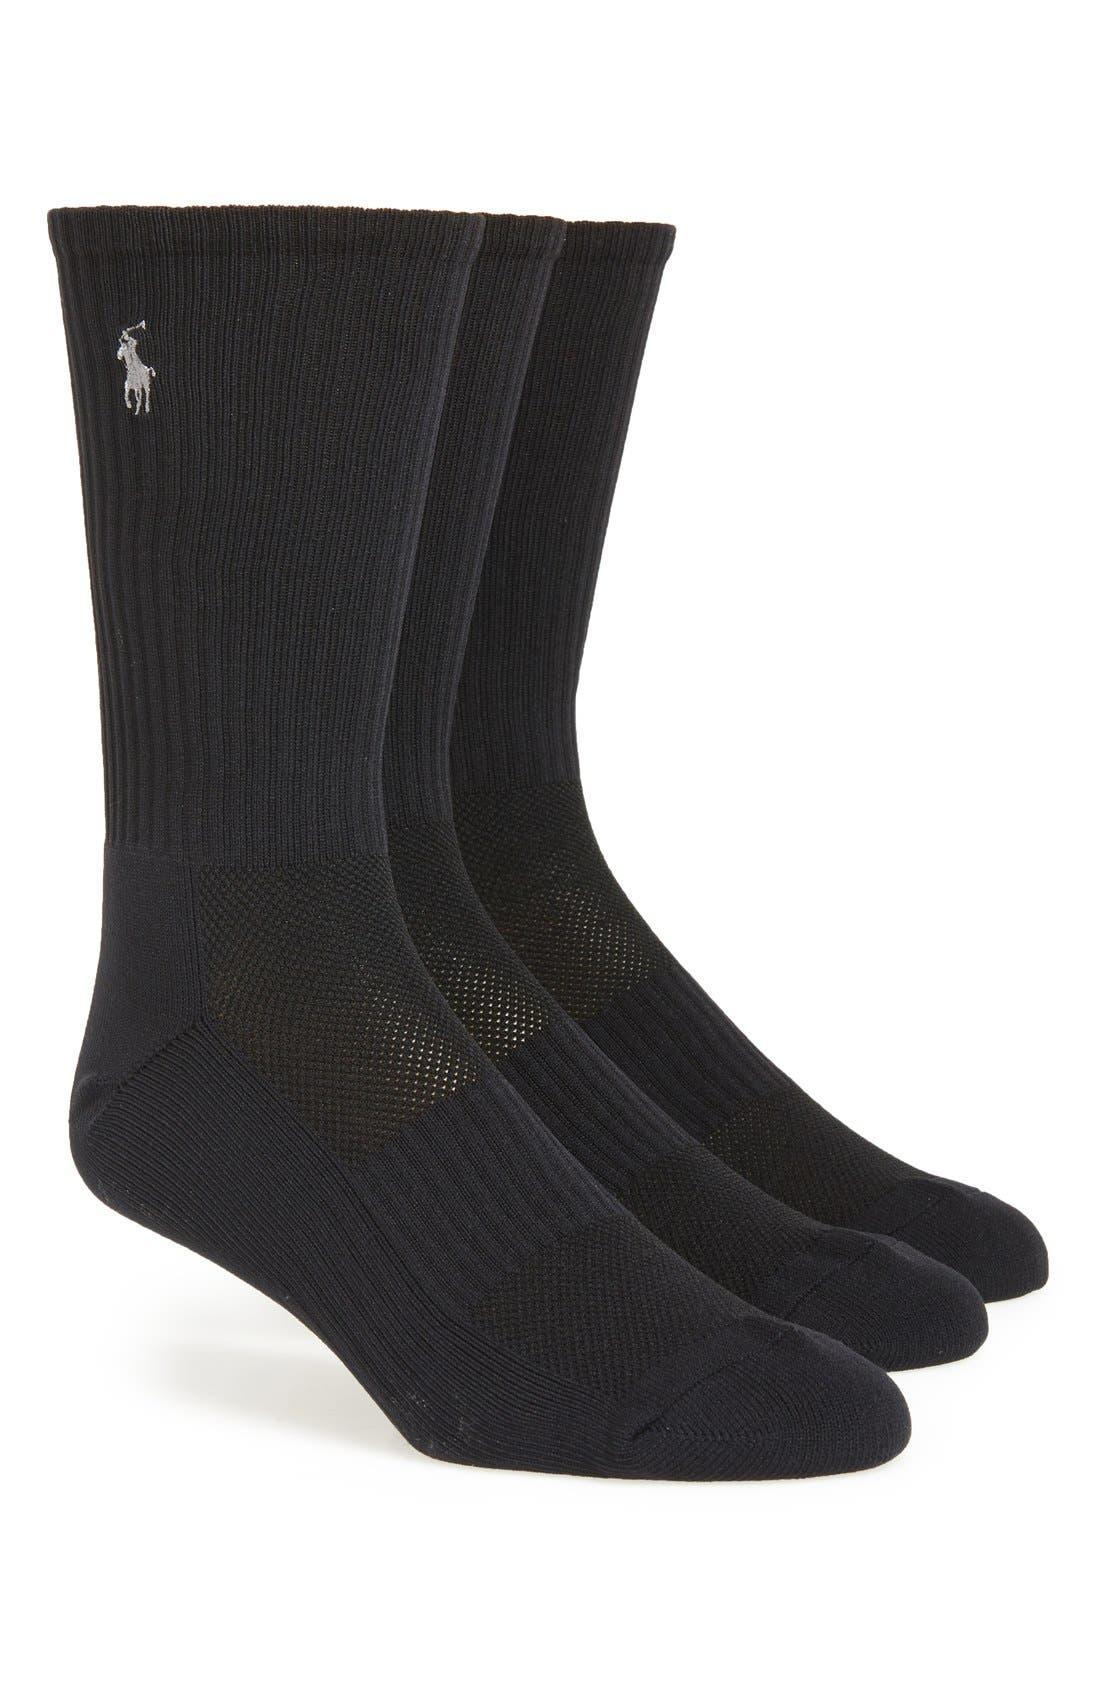 Tech Athletic Crew Socks,                         Main,                         color, BLACK